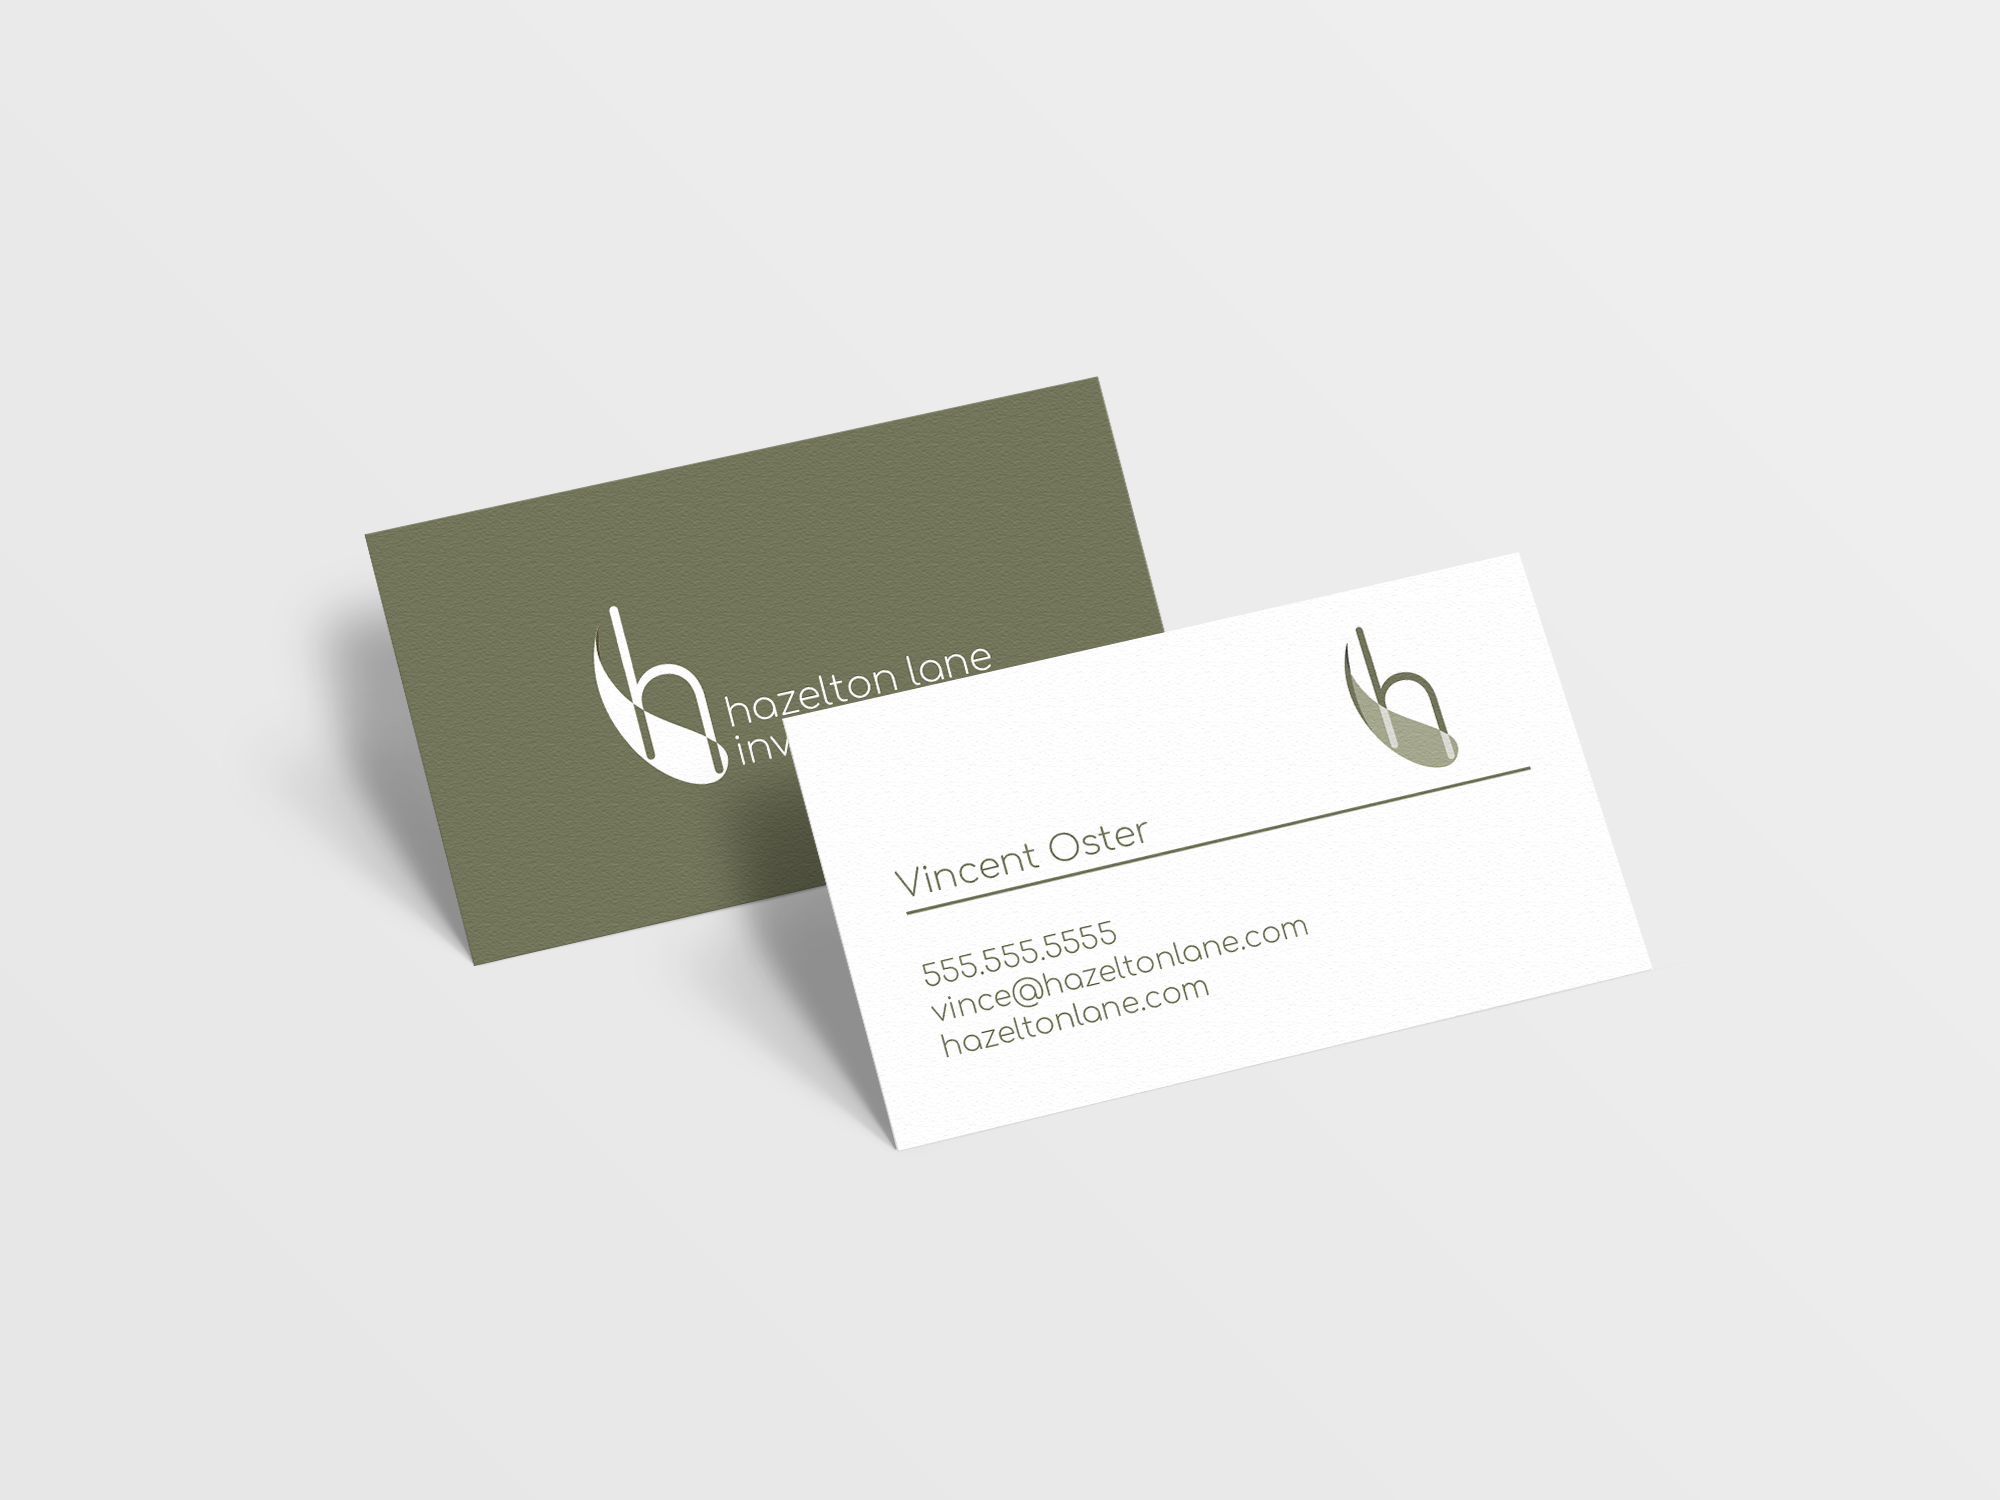 businesscardmockupinsta.png